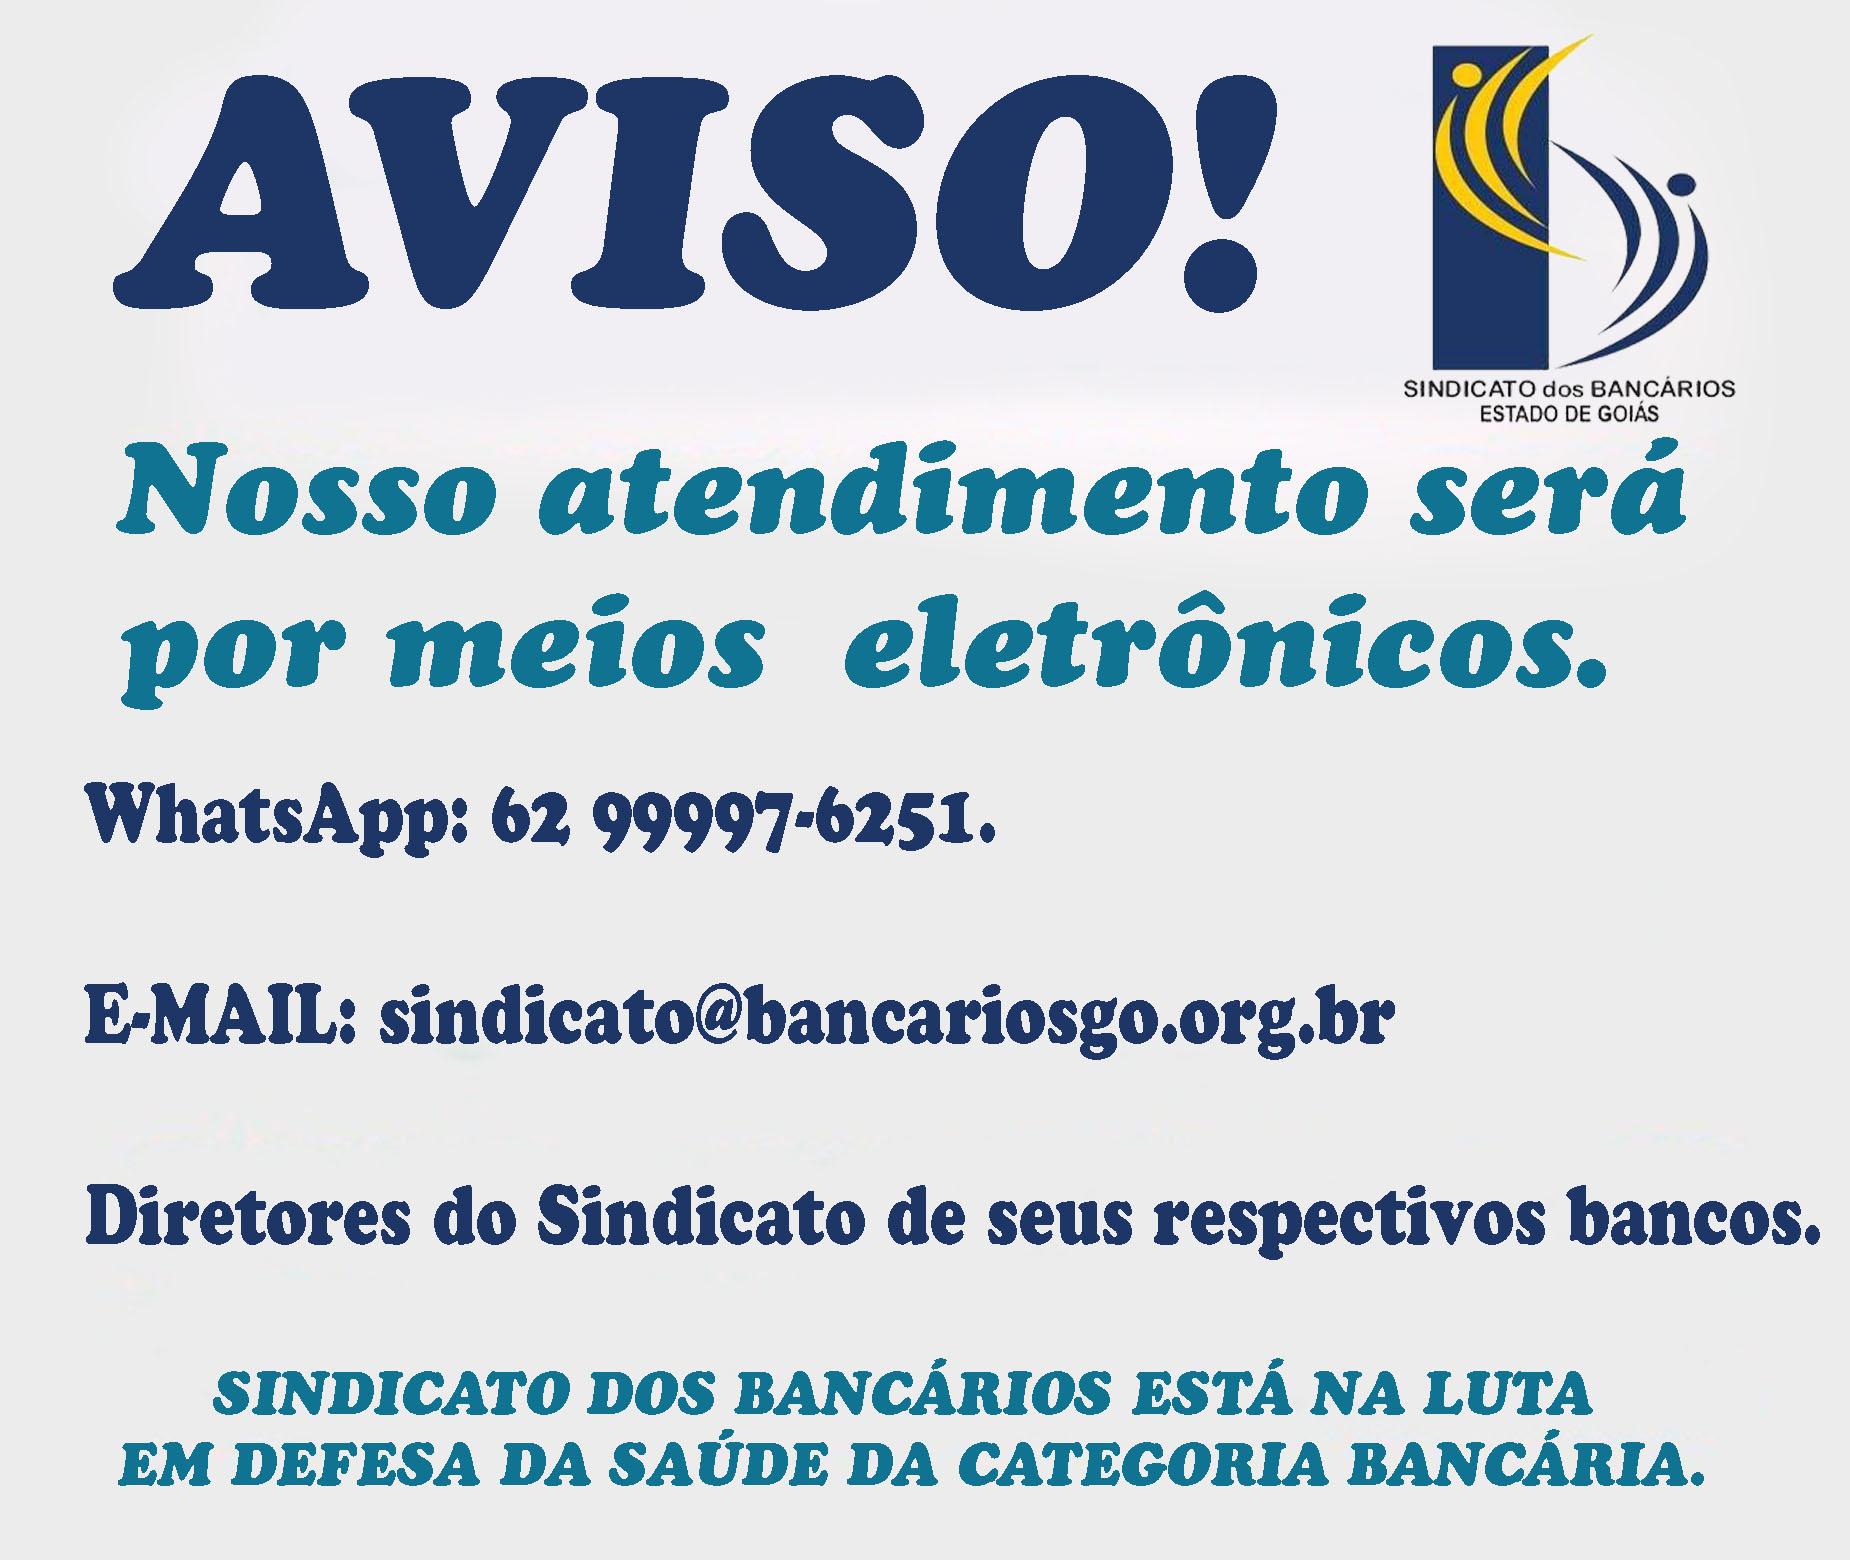 aviso-bancarios-1841406.jpg